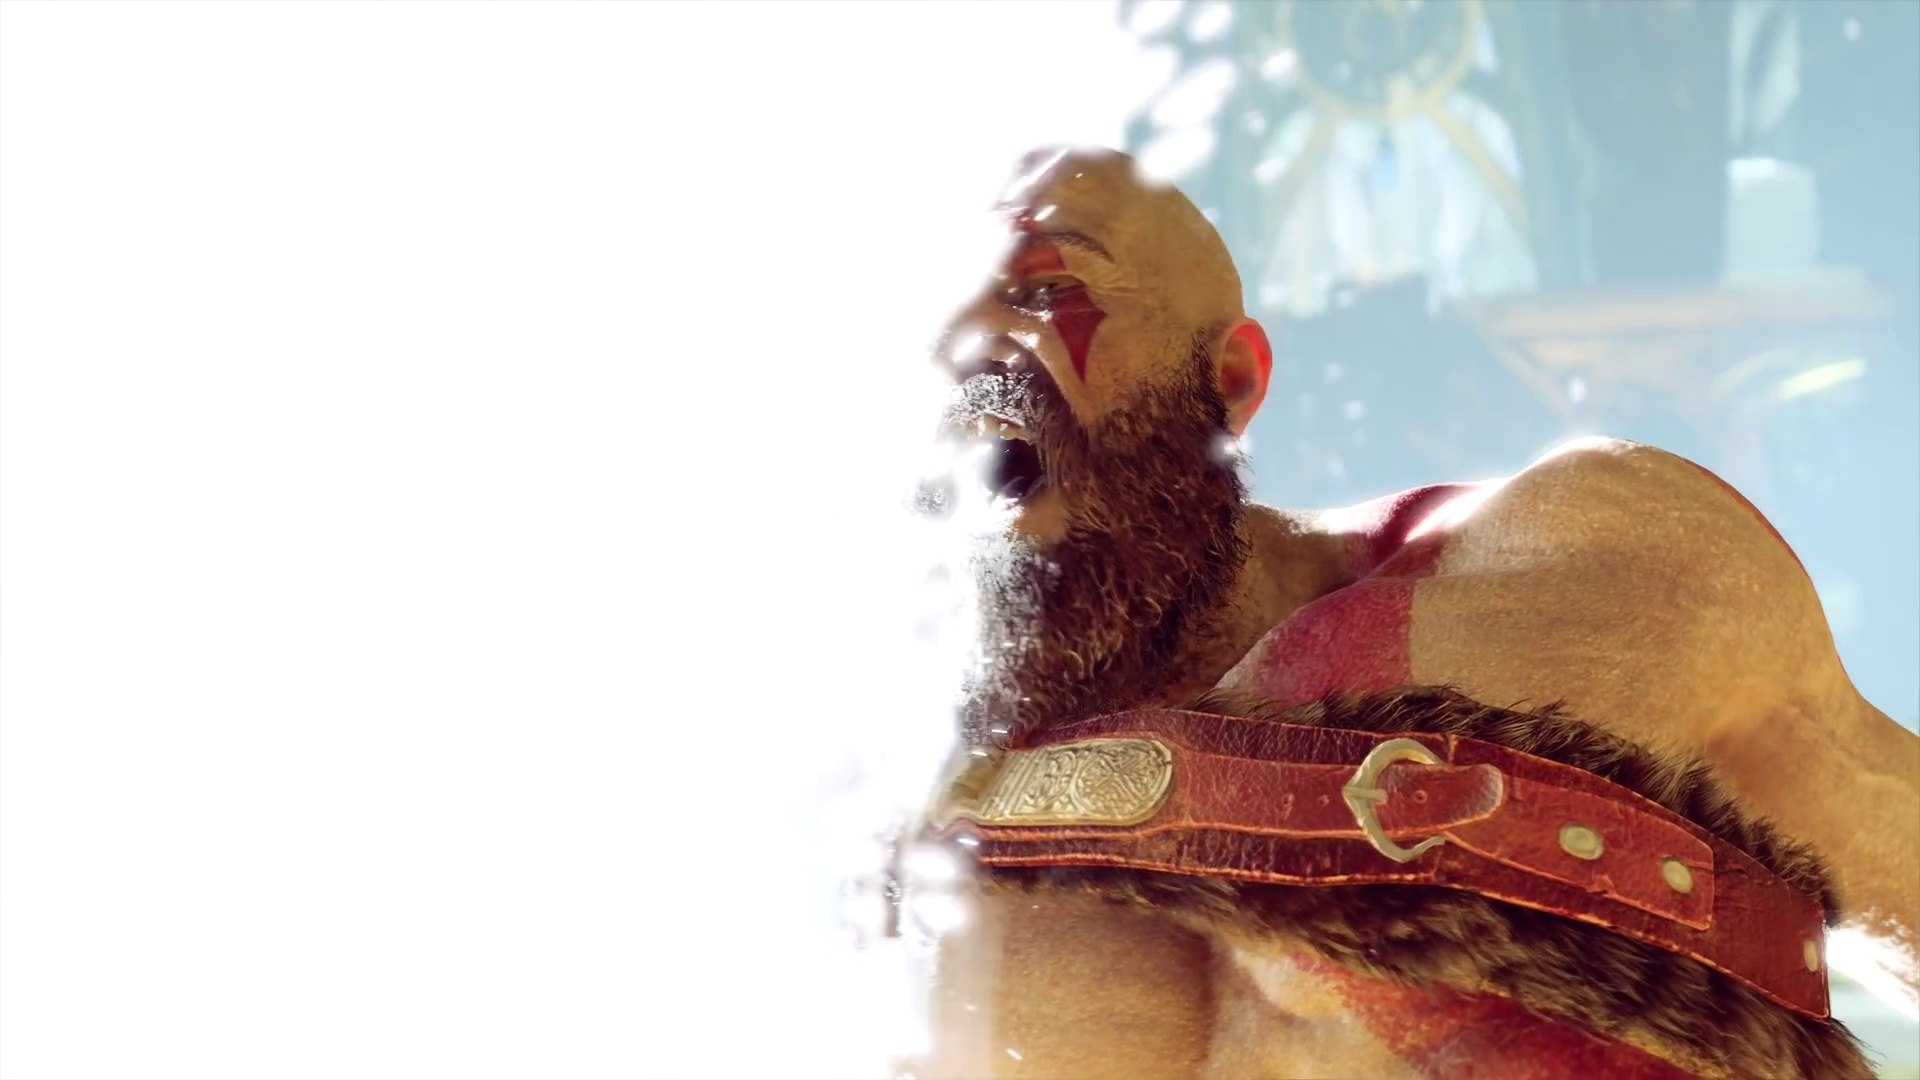 God of War 4 - Atreus Gets Mad At Kratos (God of War 2018) PS4 Pro